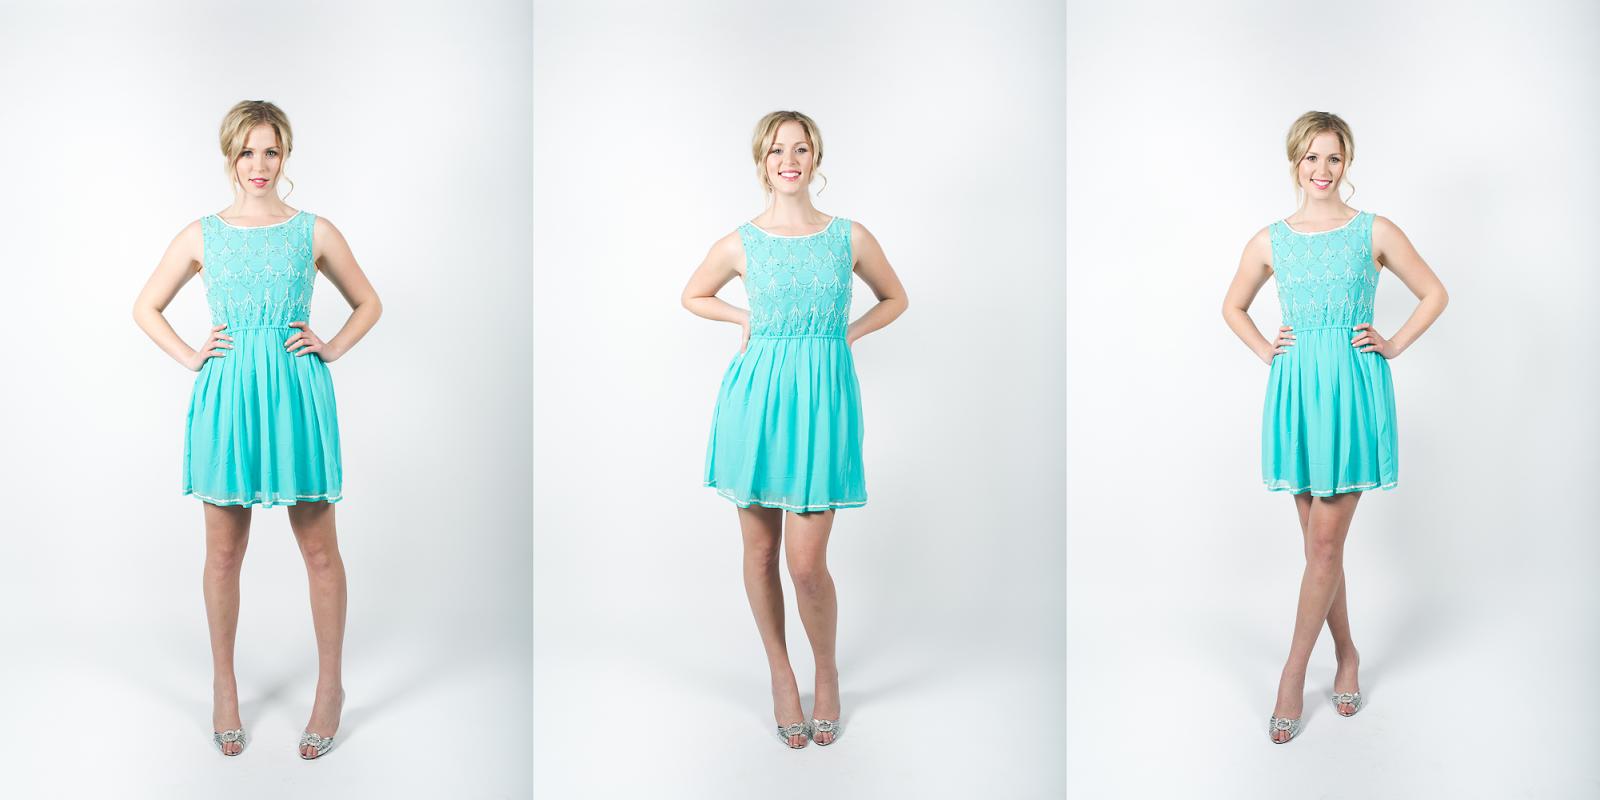 TRENDY PROM FORMAL DRESSES PLUSH BOUTIQUE SEMI-FORMAL